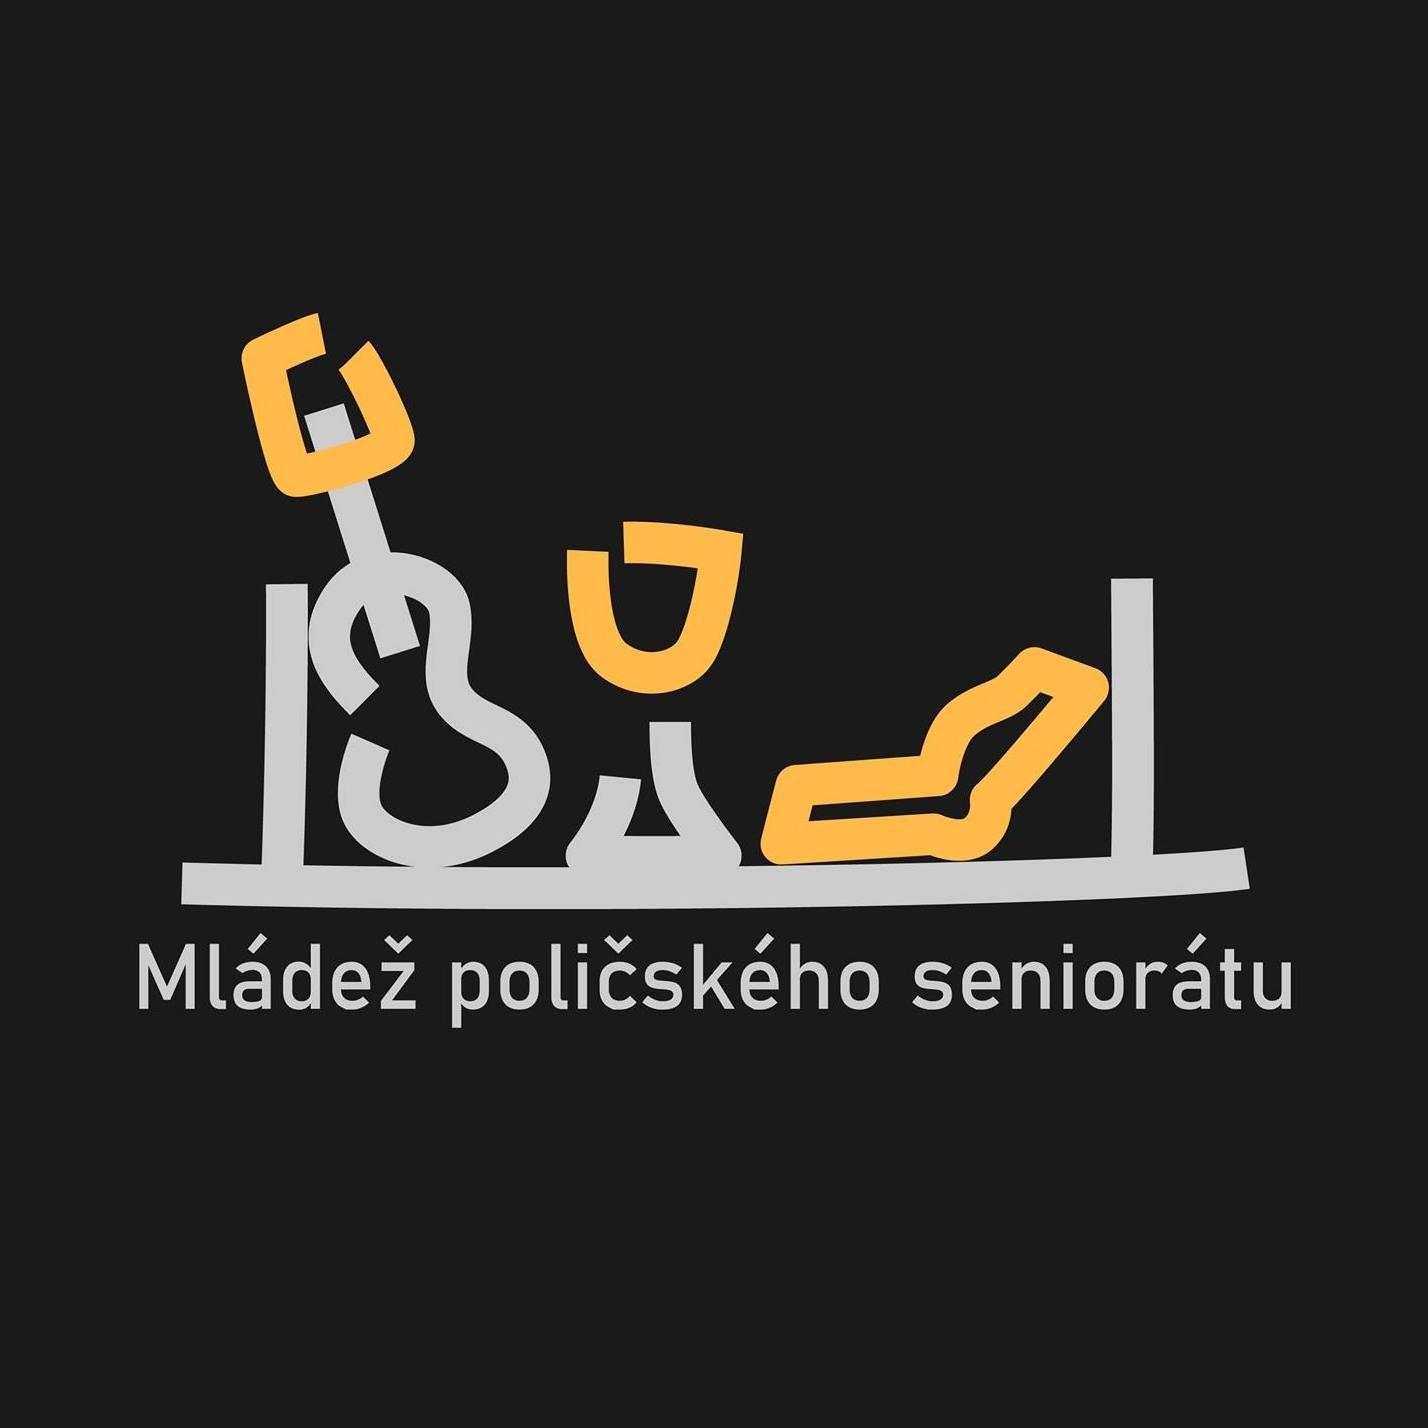 Mládež poličského seniorátu